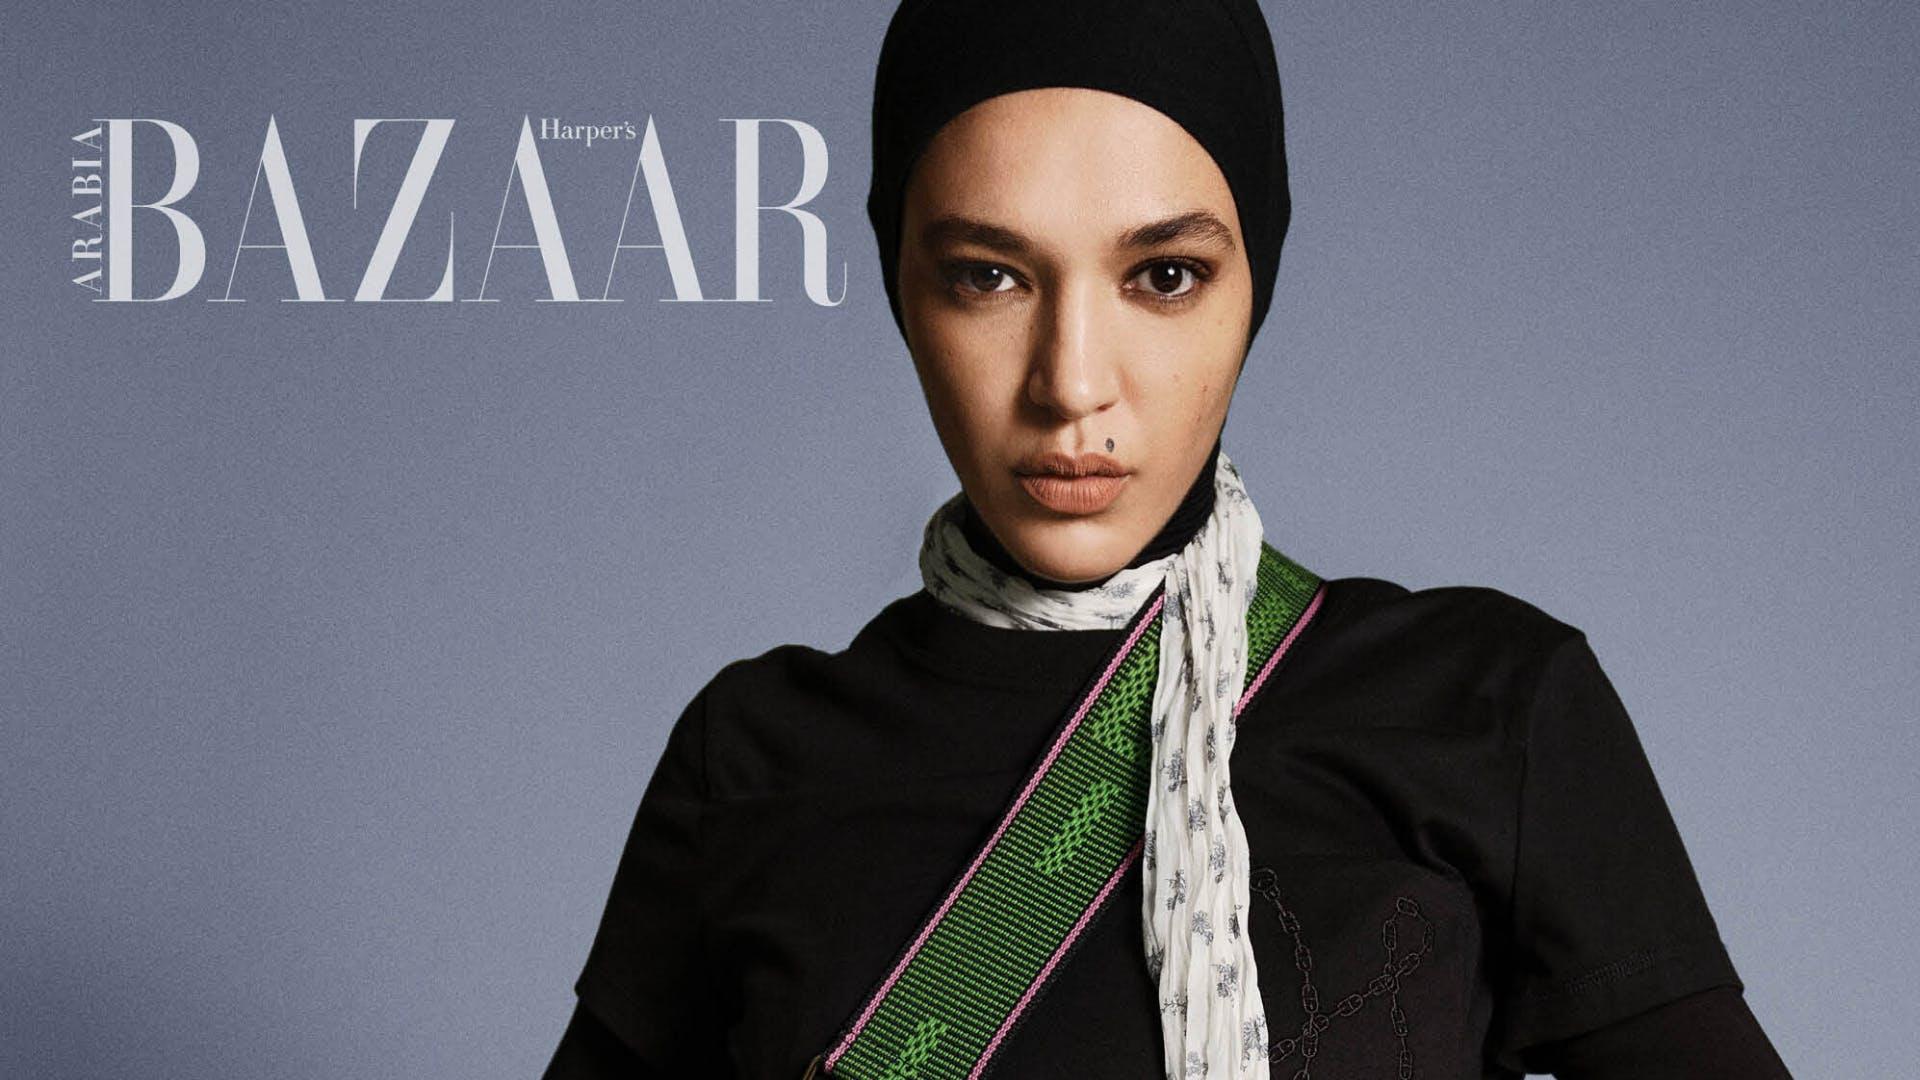 harper's bazaar arabia showcasing woman in abayas